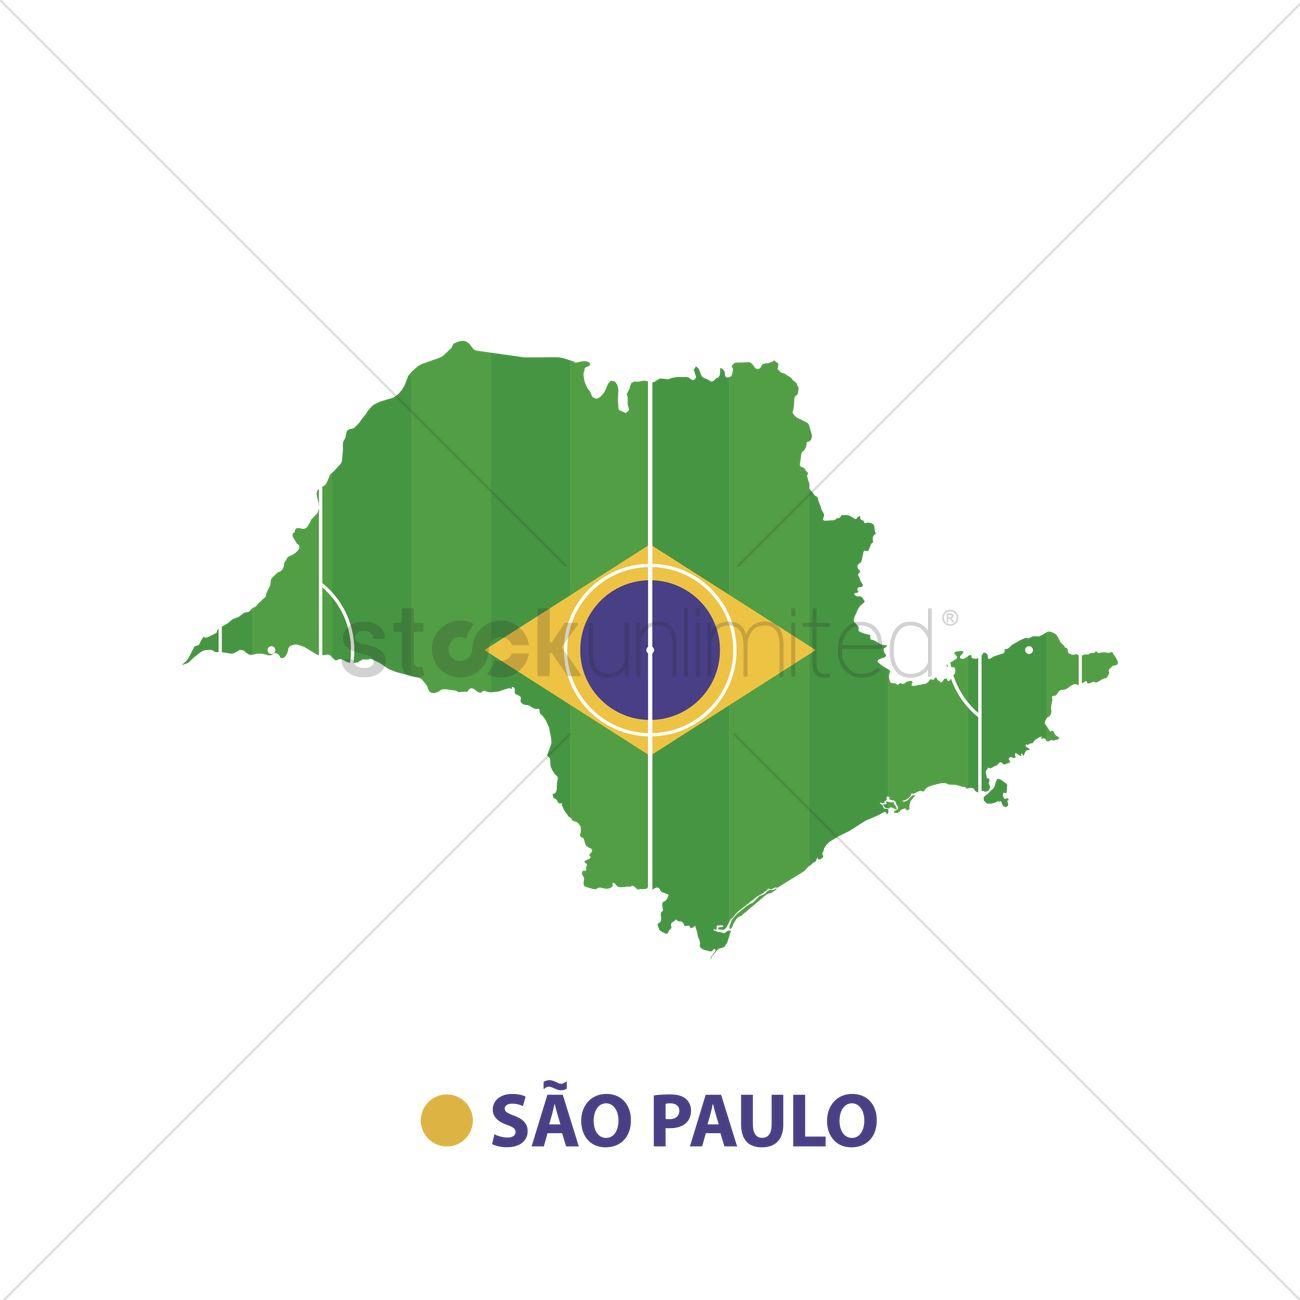 Sao Paulo State Map.Sao Paulo State Map Vector Image 1581095 Stockunlimited